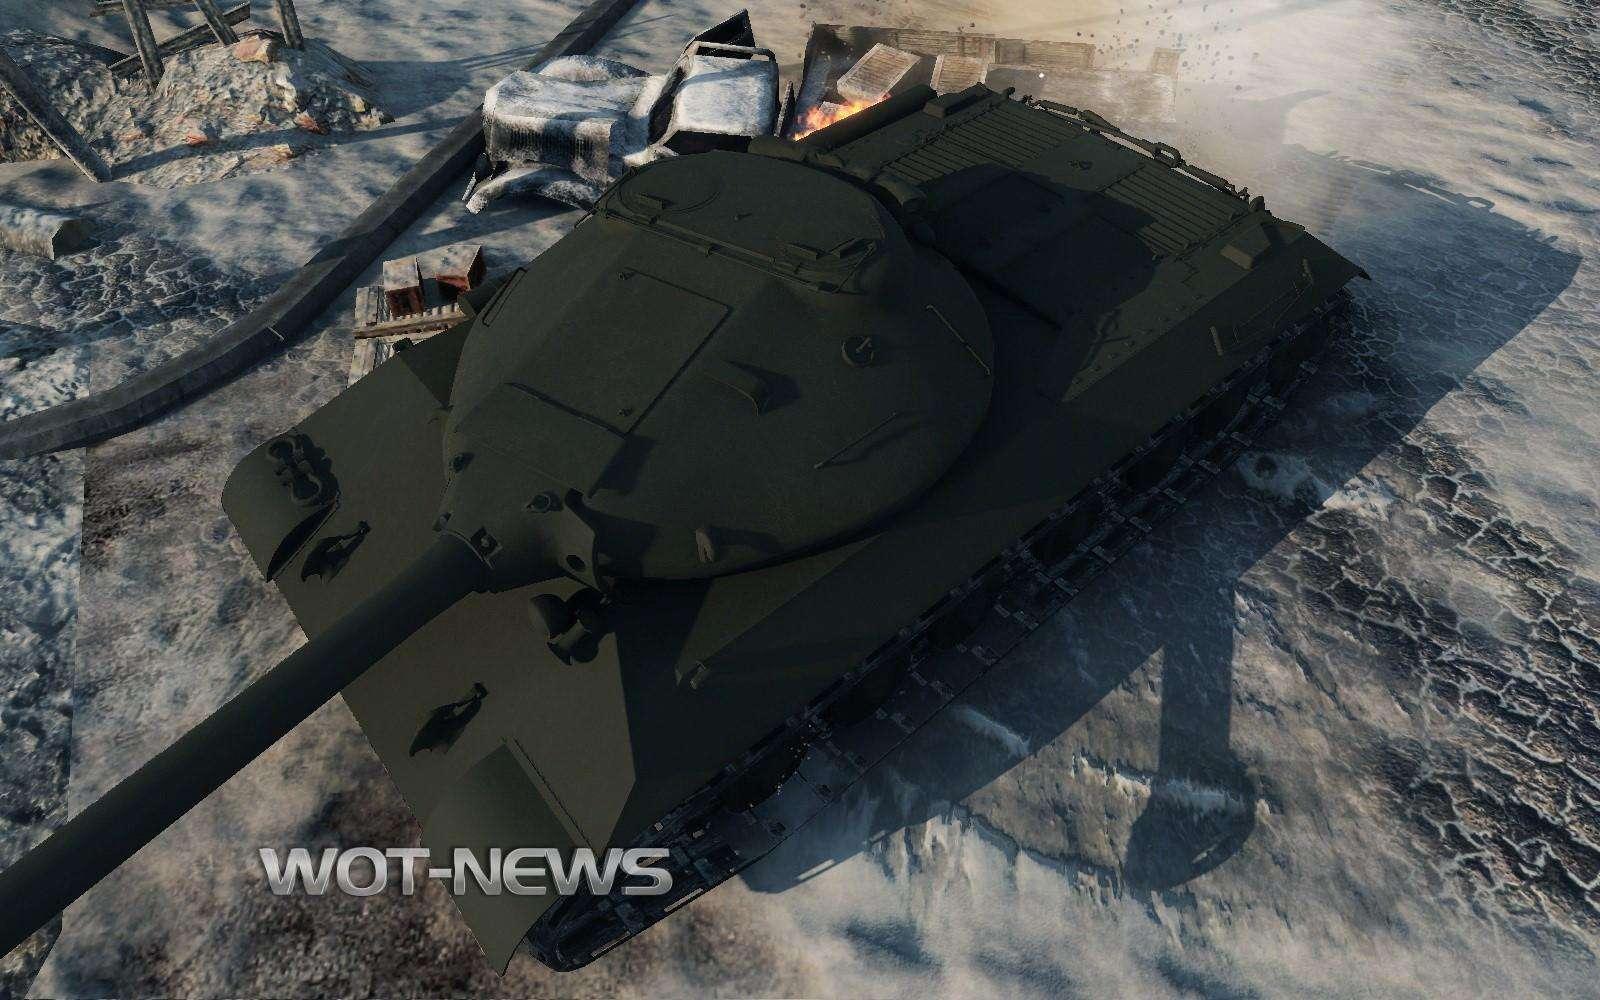 Kirovets-1 (IS-3 prototype) (Premium tier 8) - Upcoming